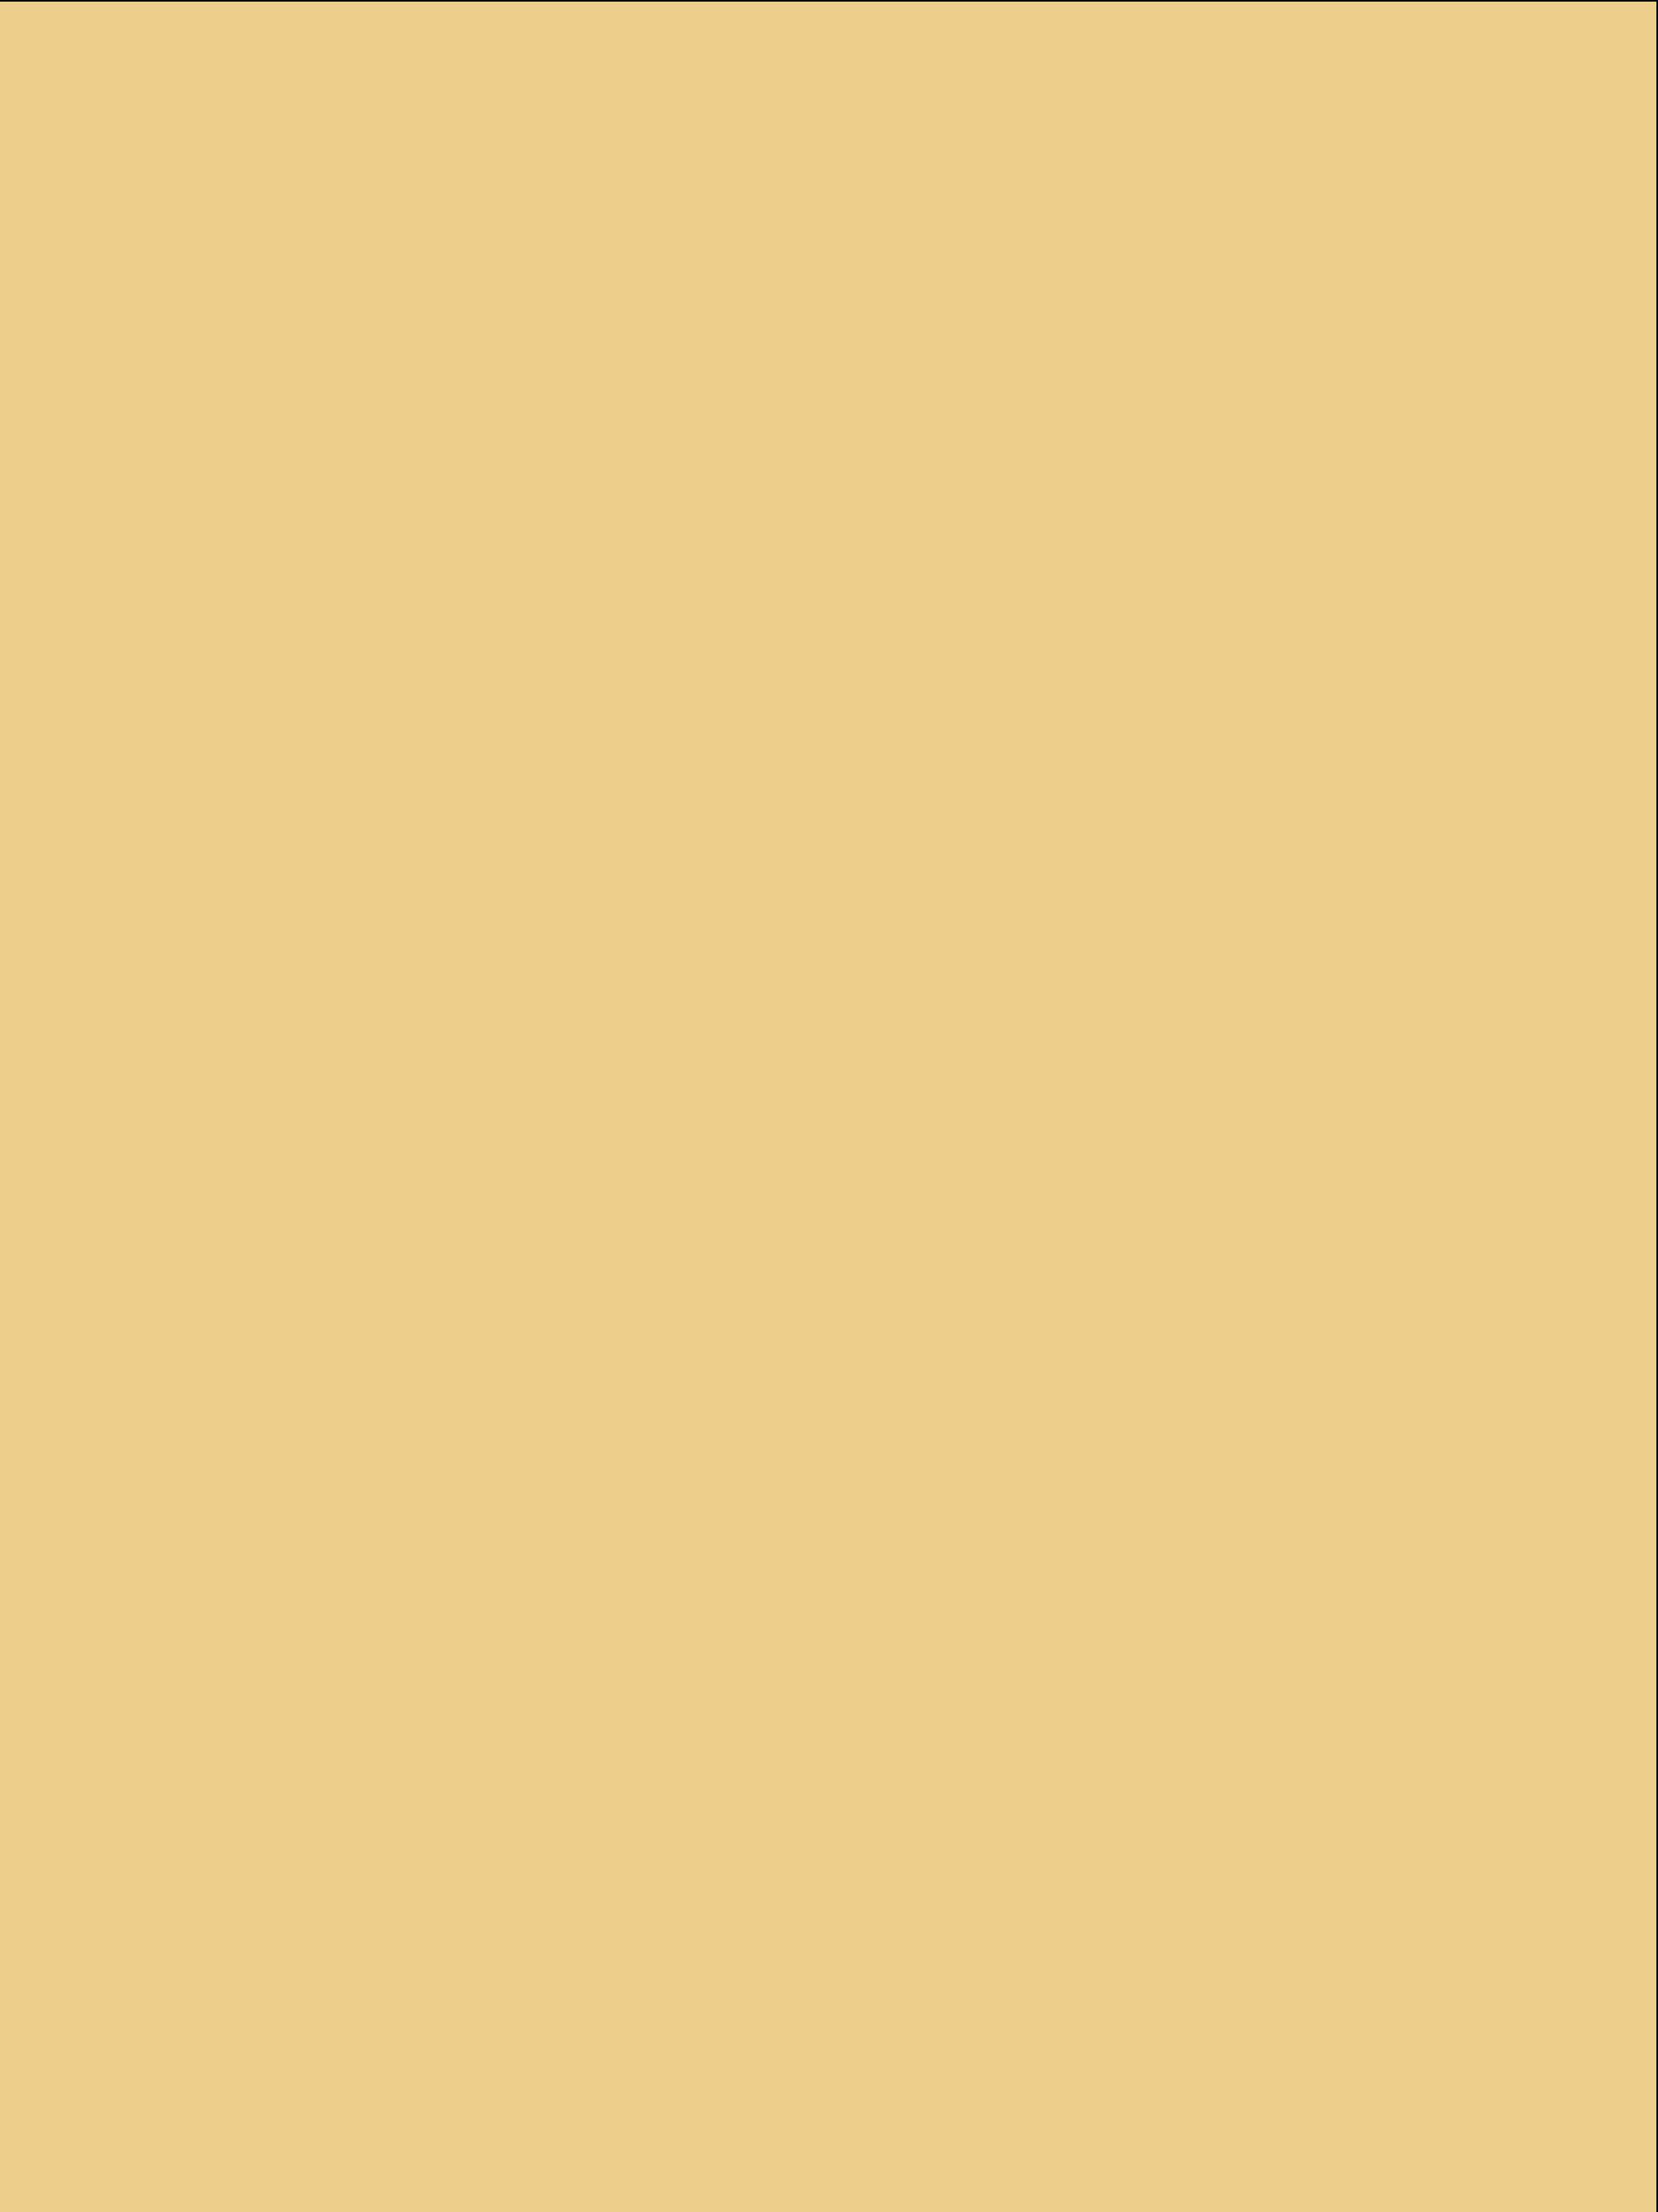 Ipad Vertical_2048x2732_Plaid_Gold.png